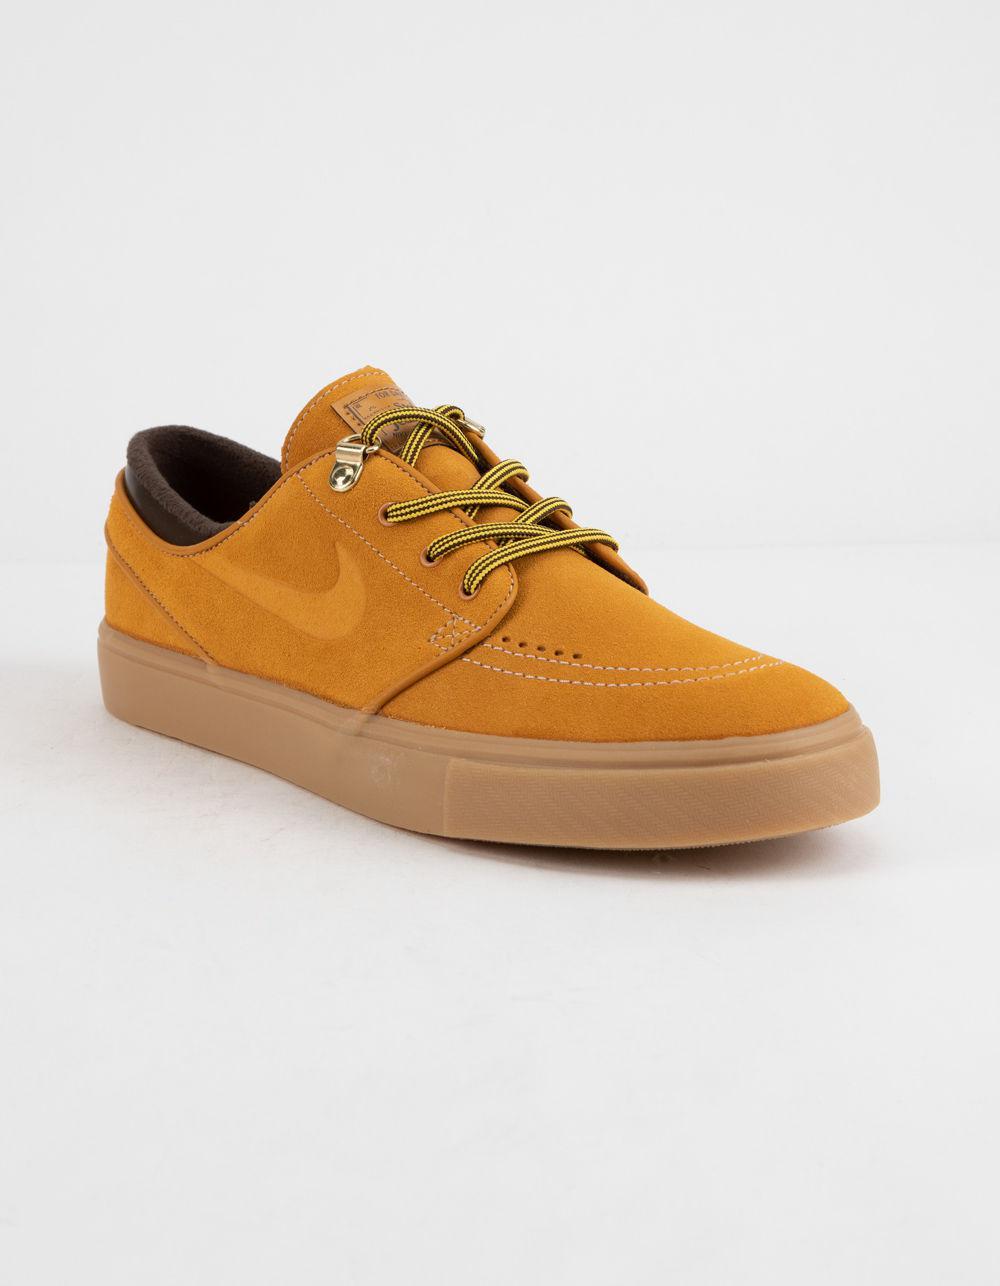 892e8b7f73ec Lyst - Nike Zoom Janoski Premium Bronze Gum Light Brown Shoes in Brown for  Men